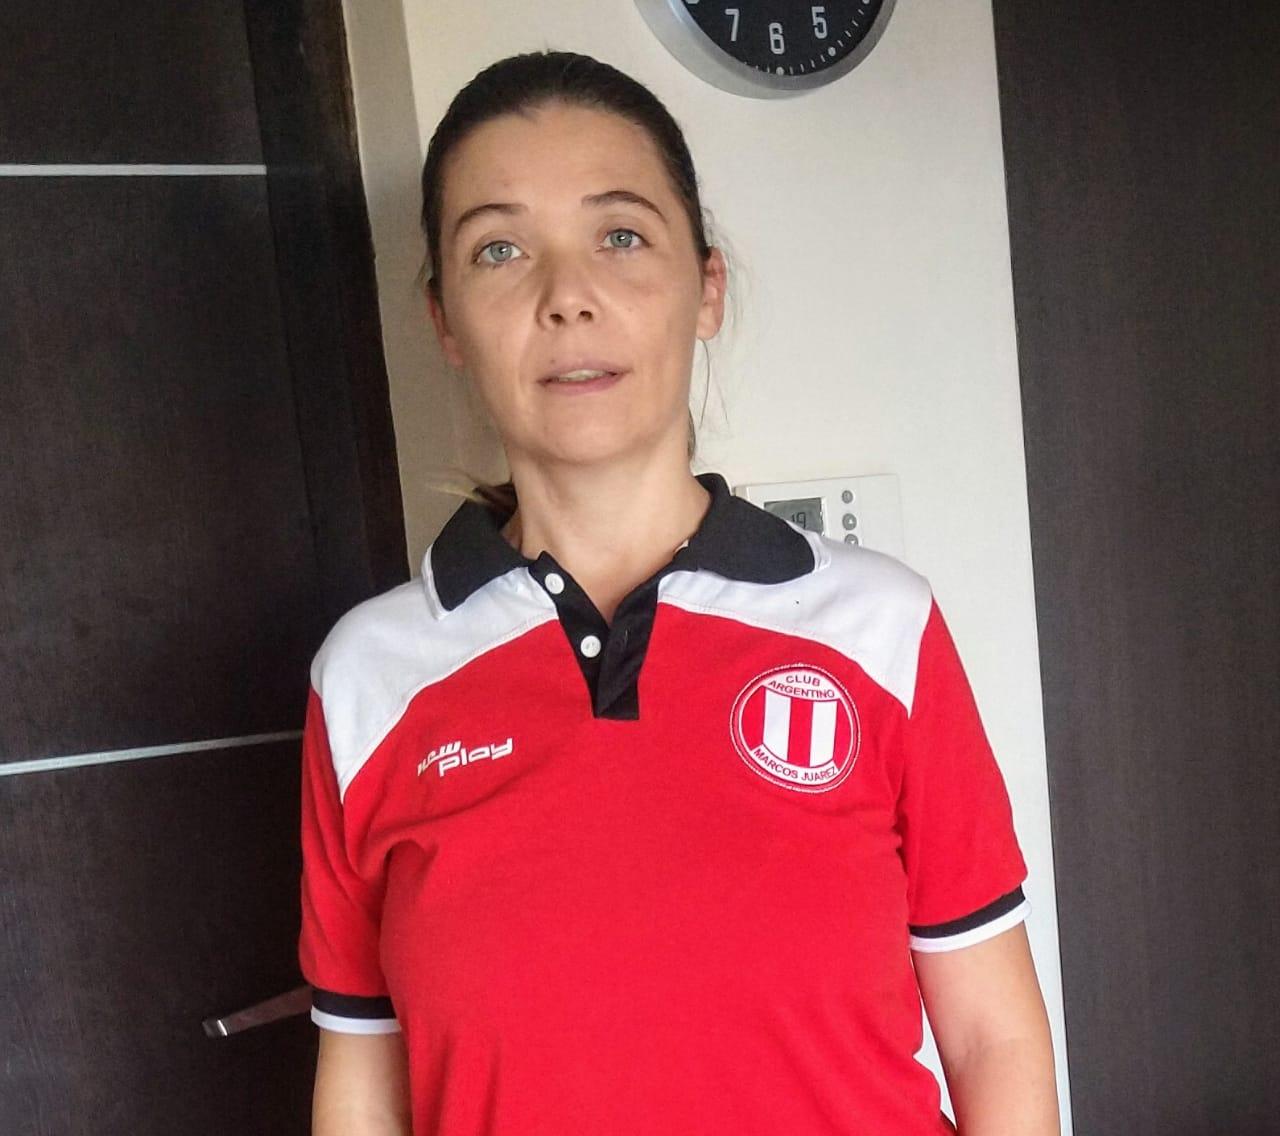 http://clubargentinomj.com.ar/wp-content/uploads/2020/06/Rosalia-Montegut.jpg